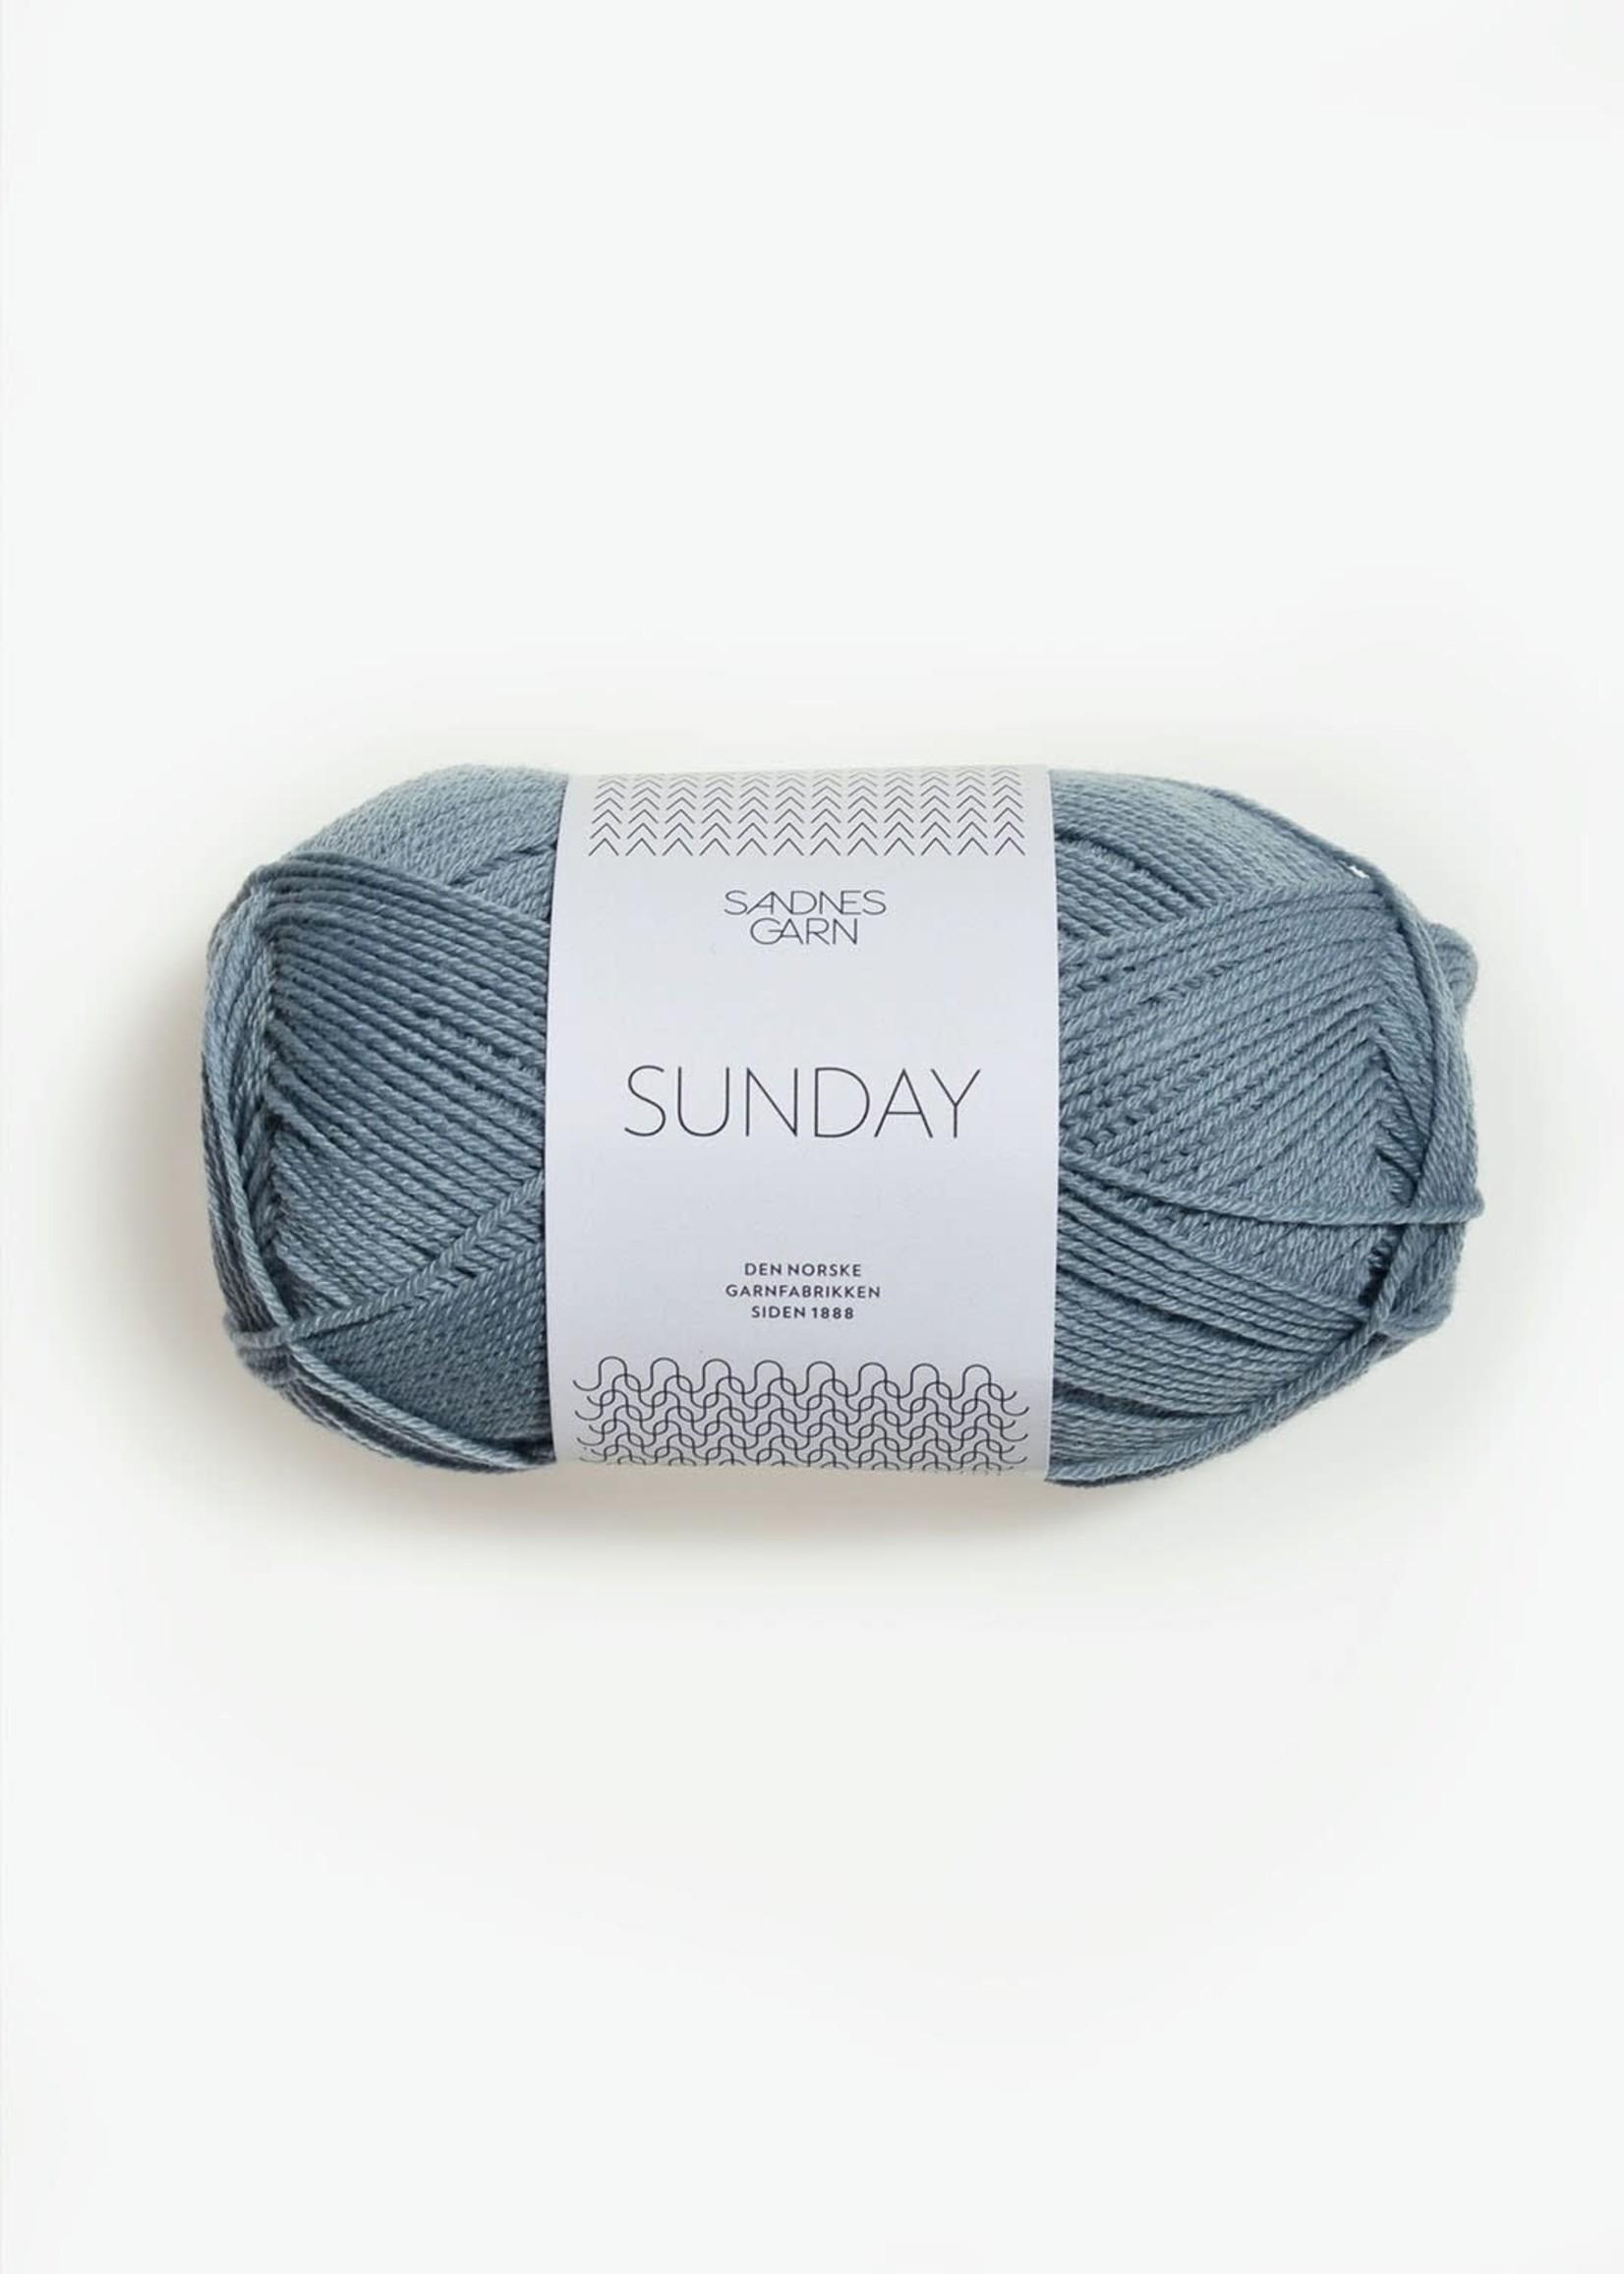 Sandnes Garn Sunday - #6501 Isbla